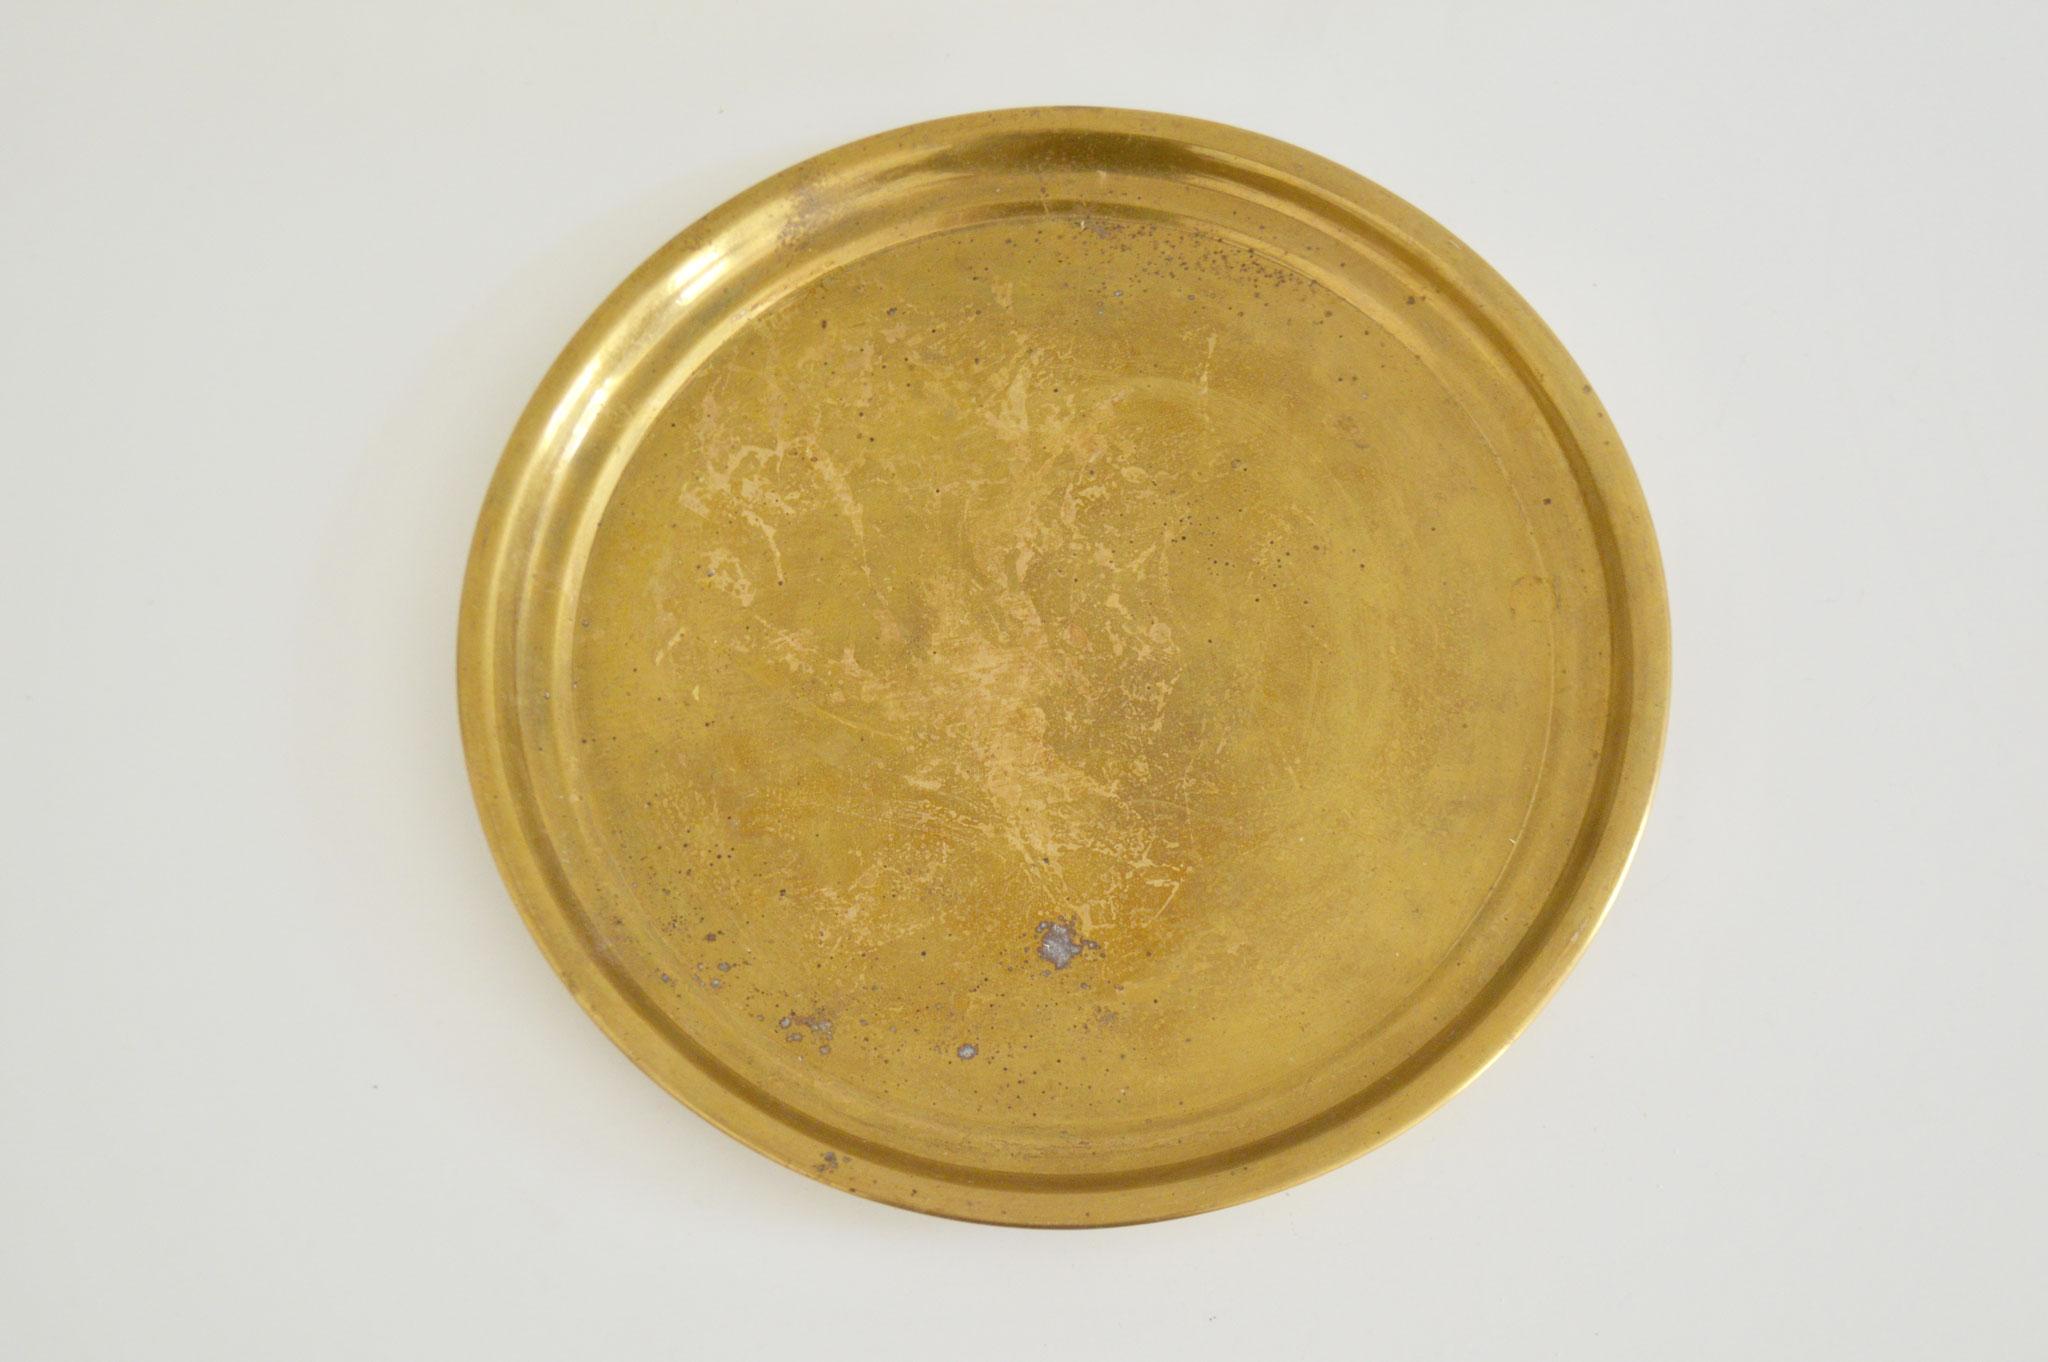 H) € 3, Durchmesser ca. 26 cm